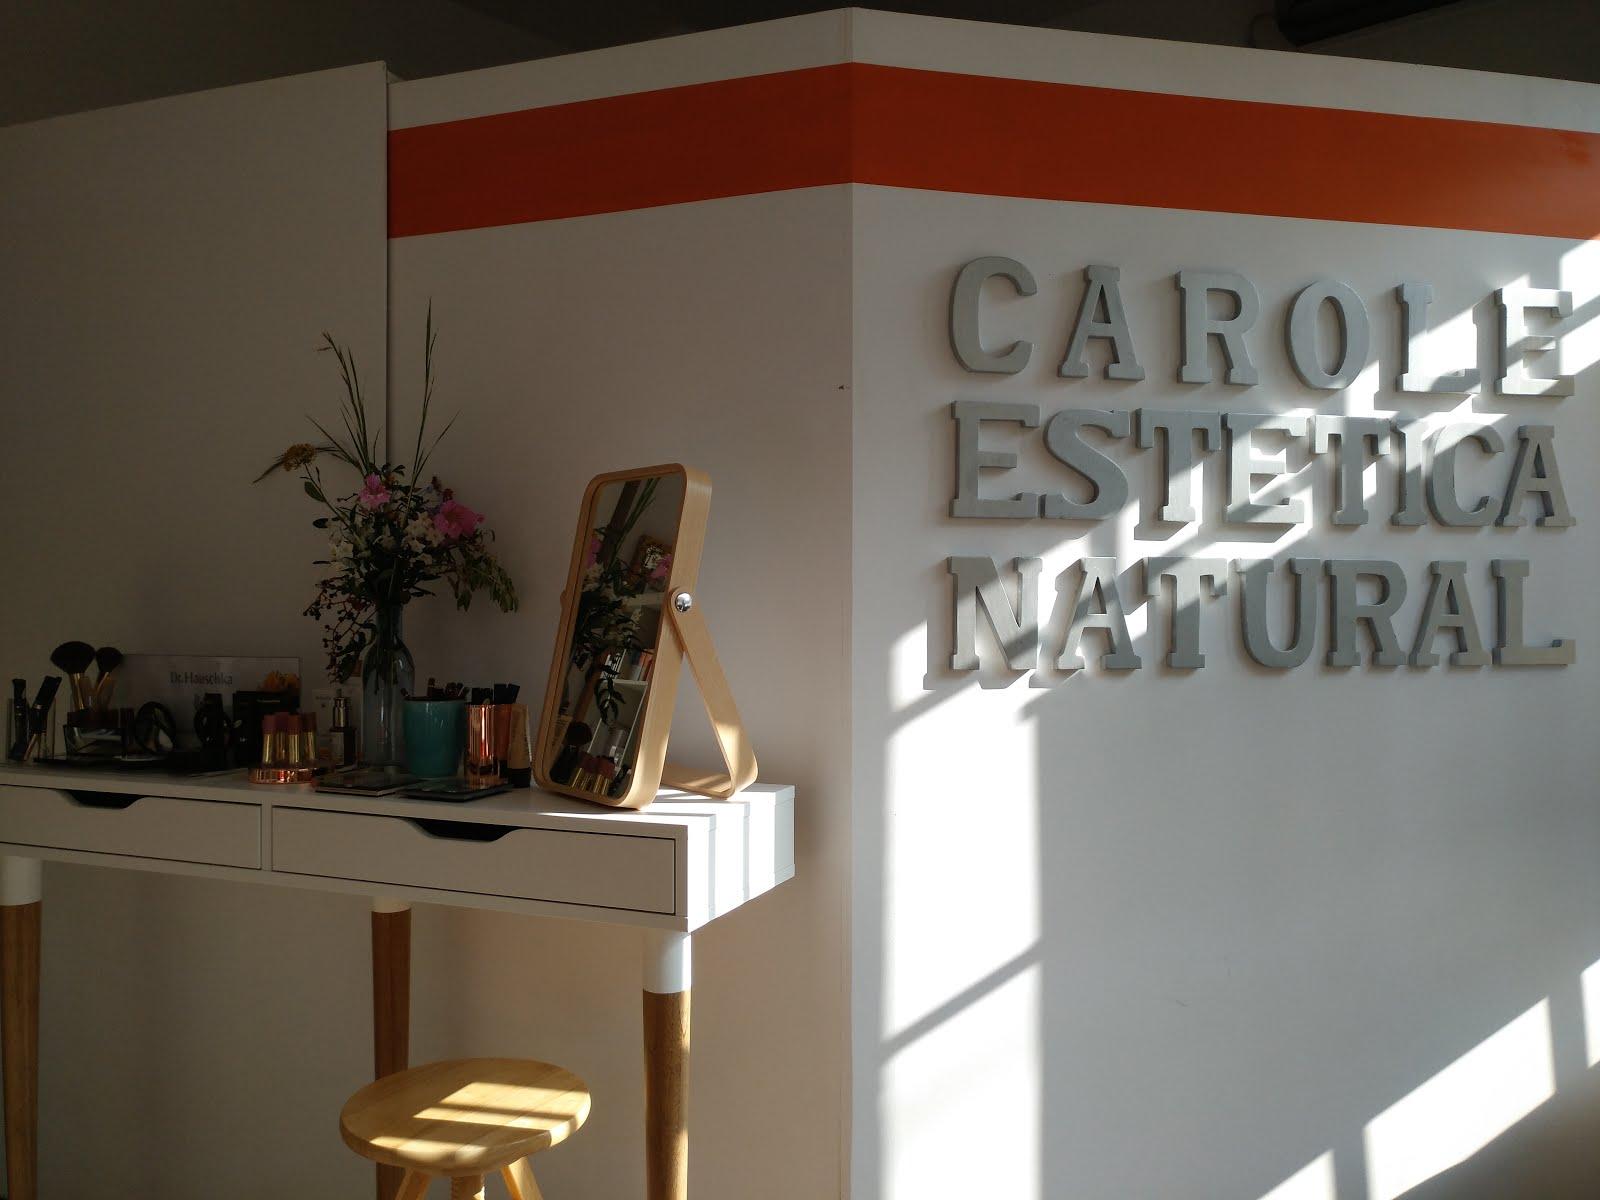 Carole estética natural